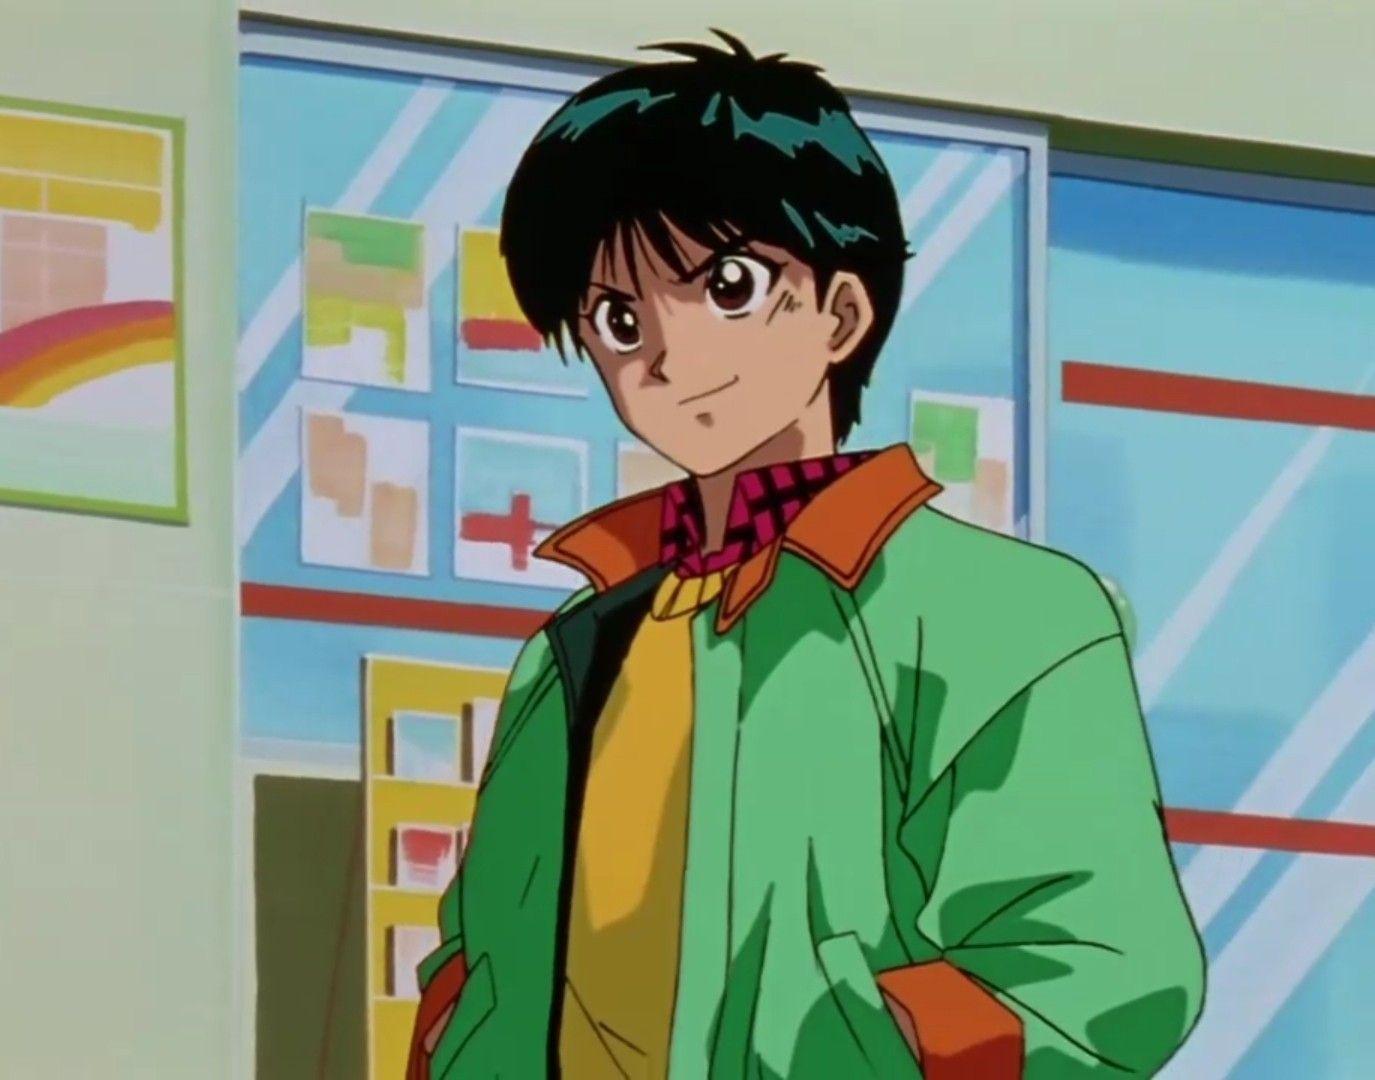 Urameshi Yusuke Aesthetic Anime 90s Anime Anime Screenshots